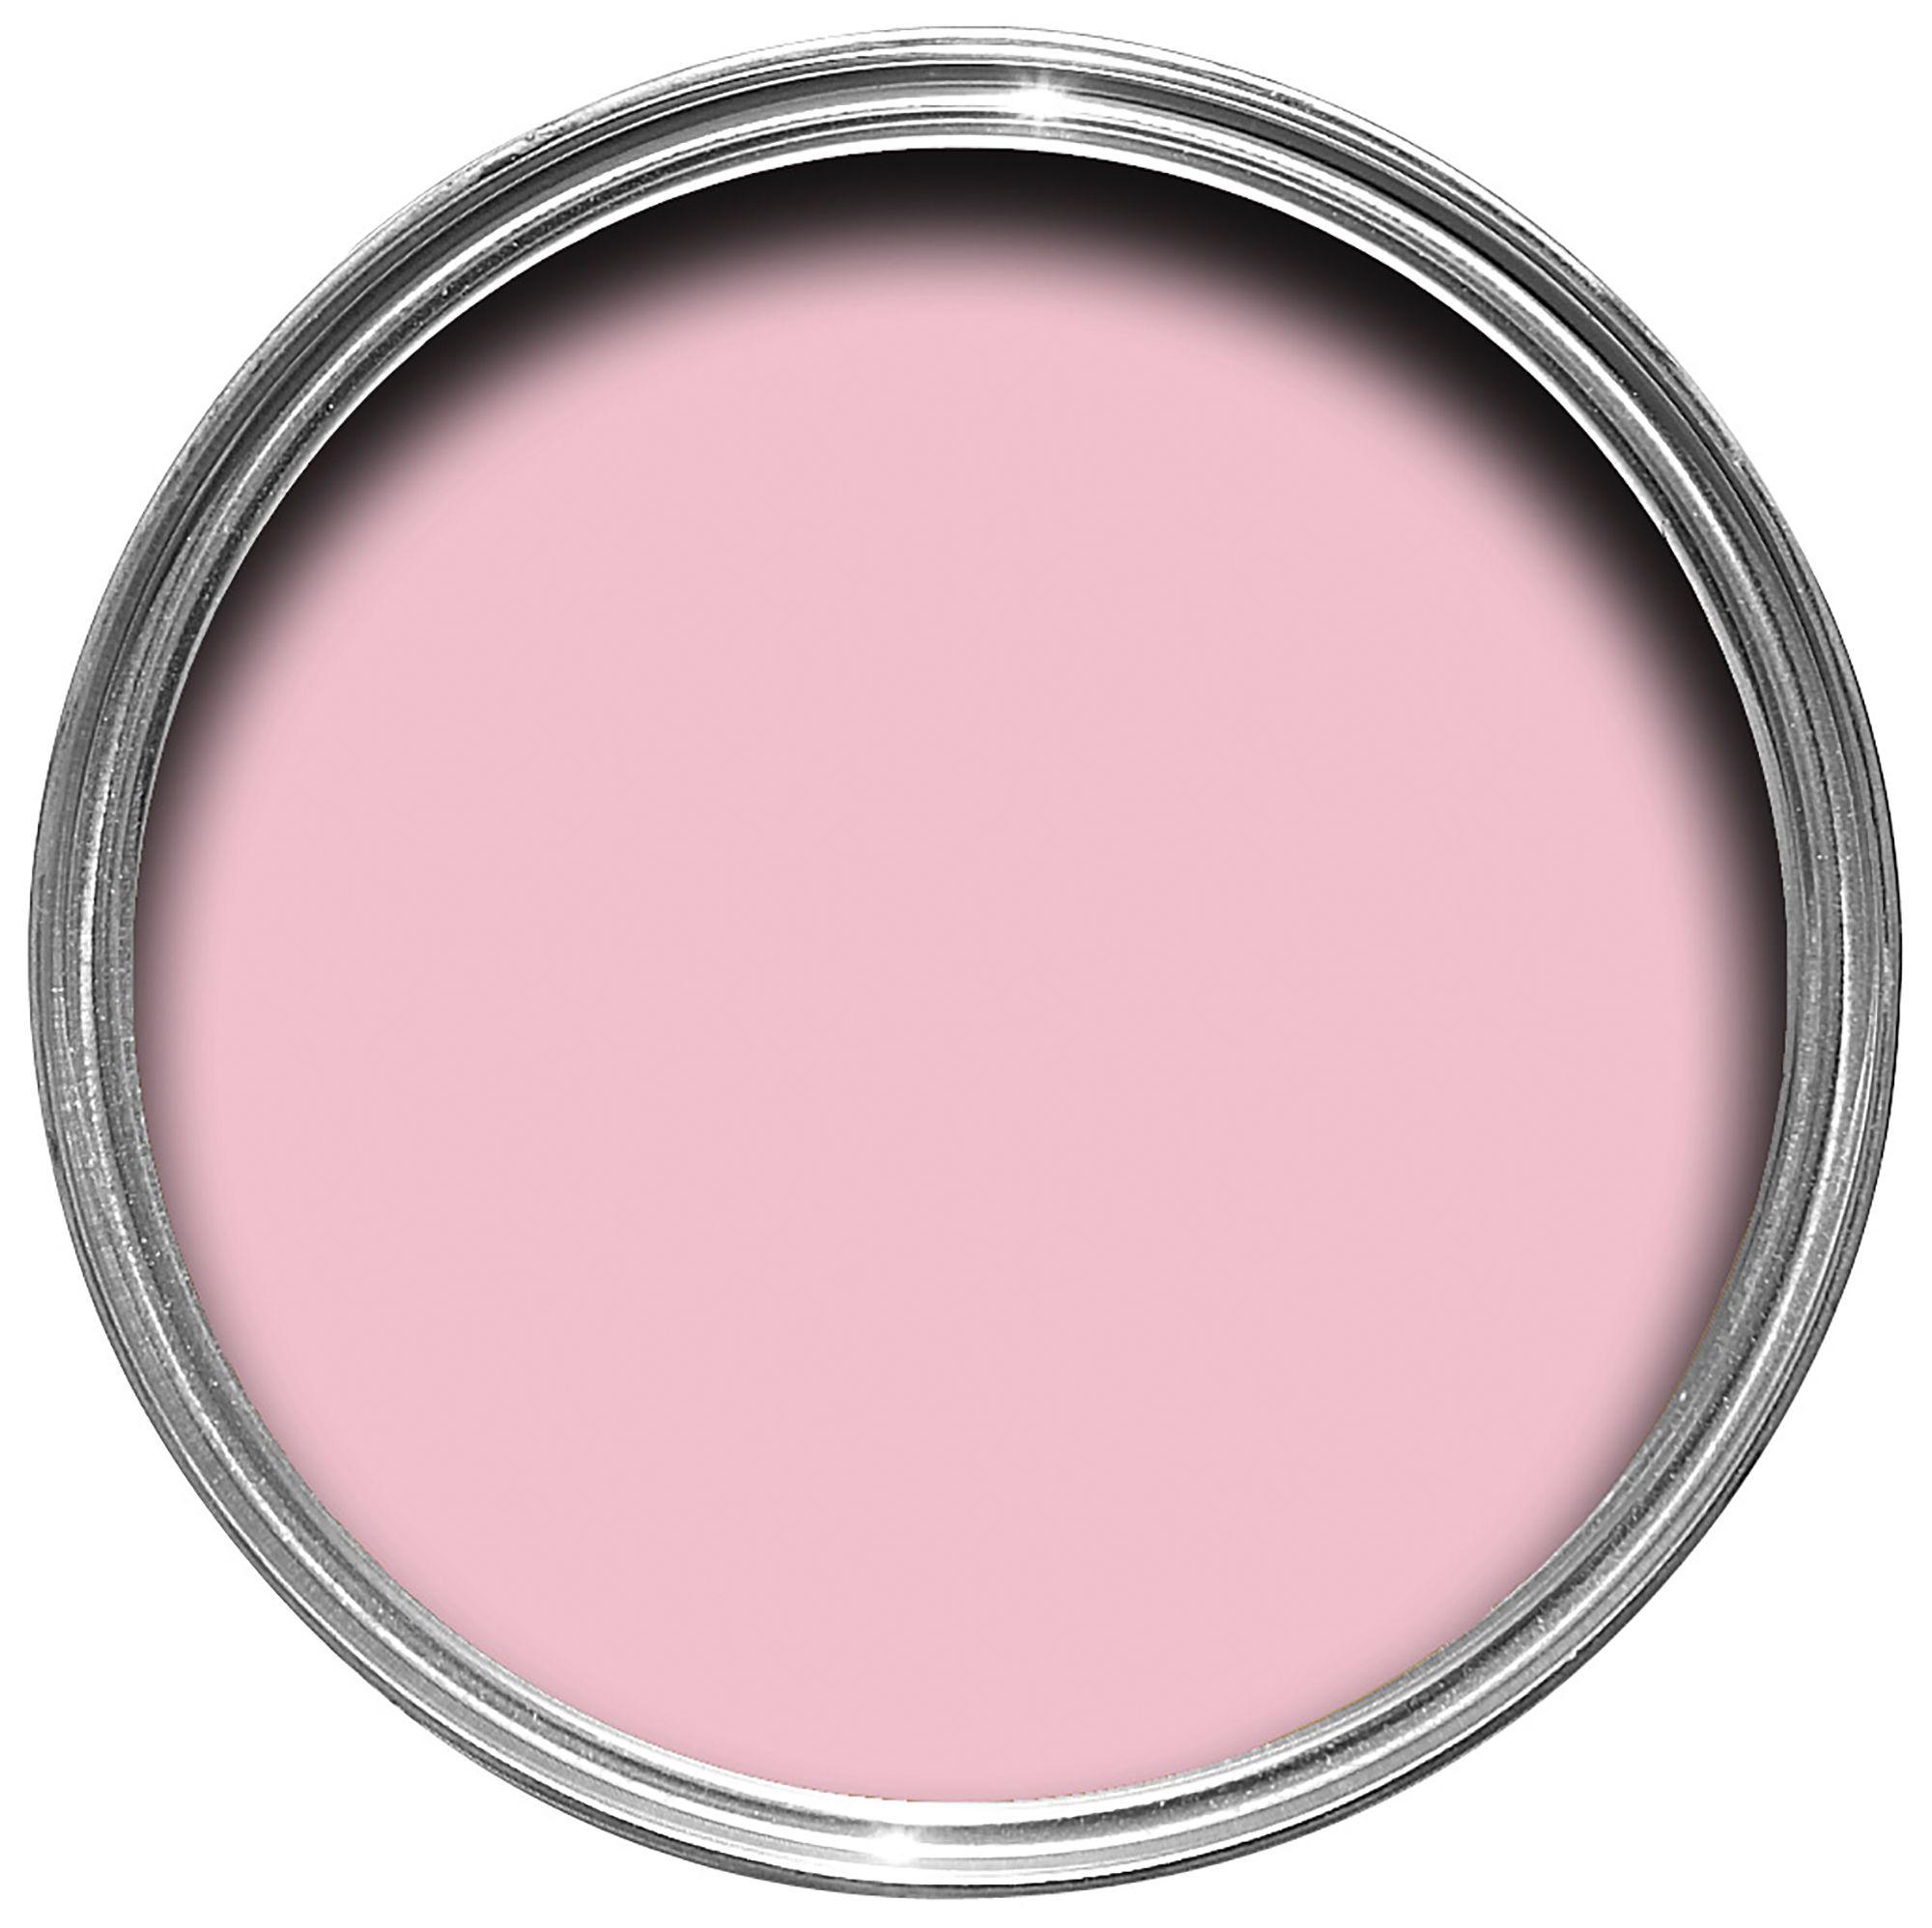 Colours Pink Pink Silk Emulsion Paint 2 5l Departments